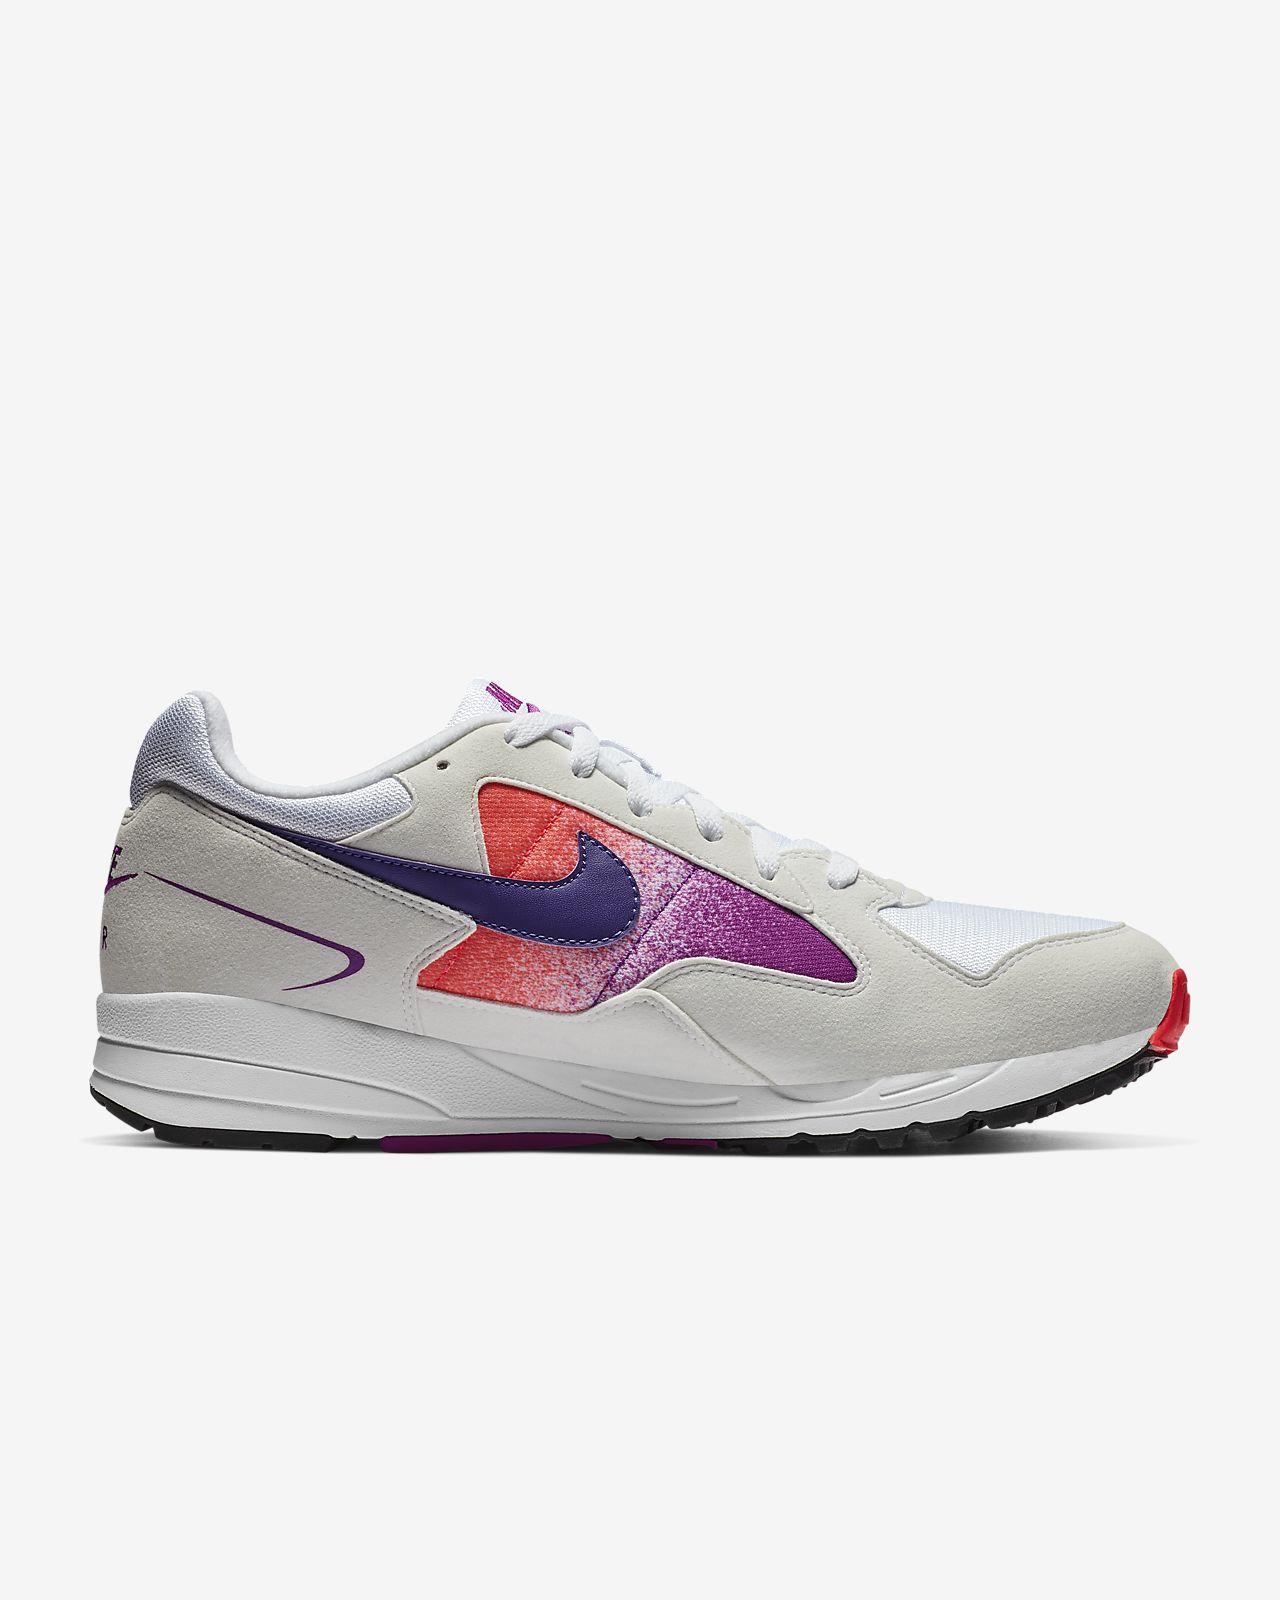 big sale 5b738 f339b ... Nike Air Skylon II Mens Shoe